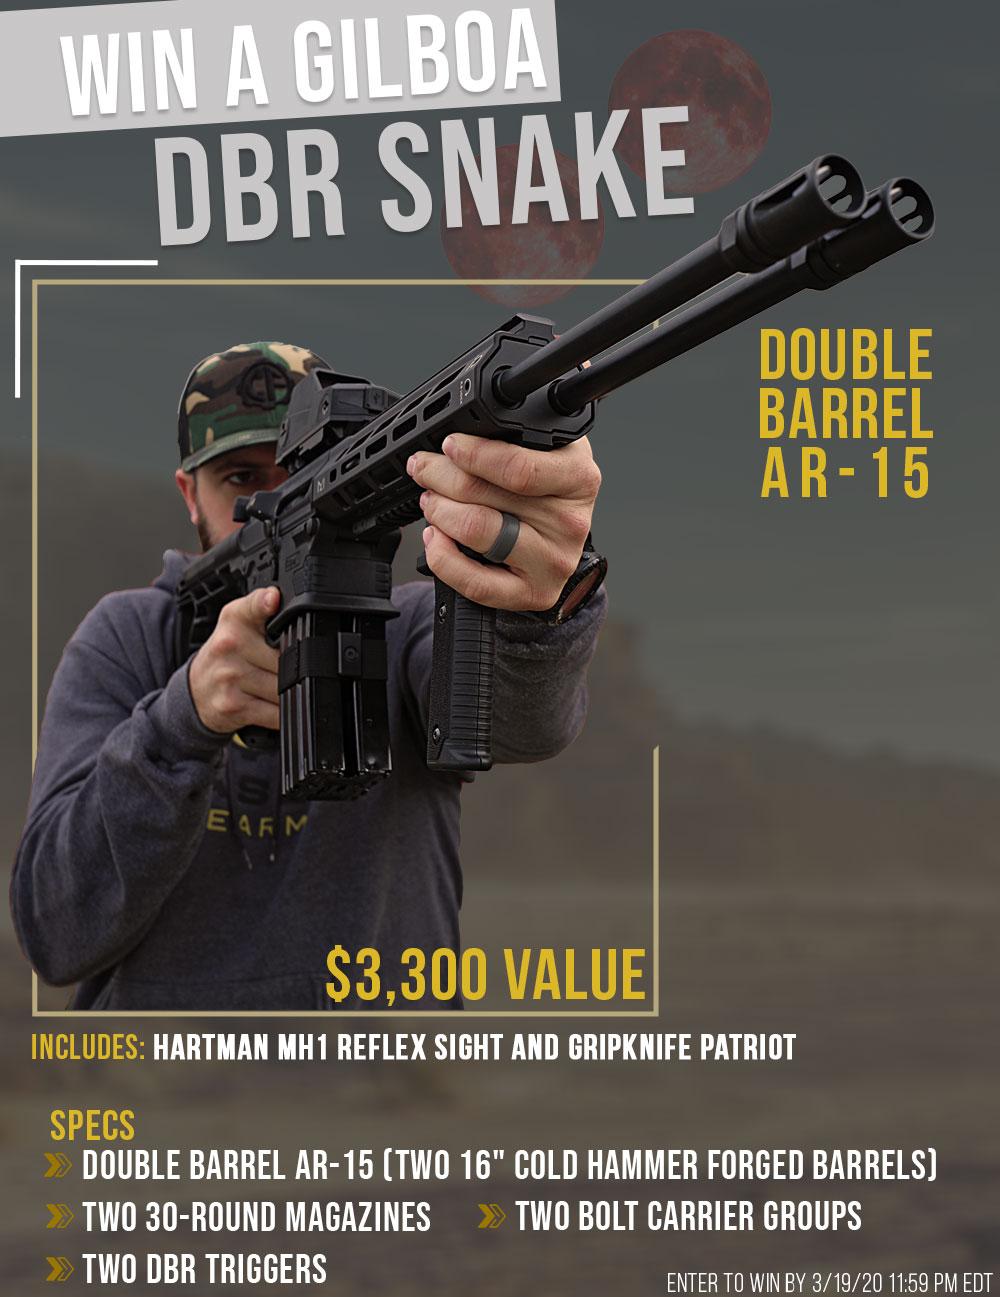 Contest - Win A Gilboa DBR Snake Double Barrel Rifle